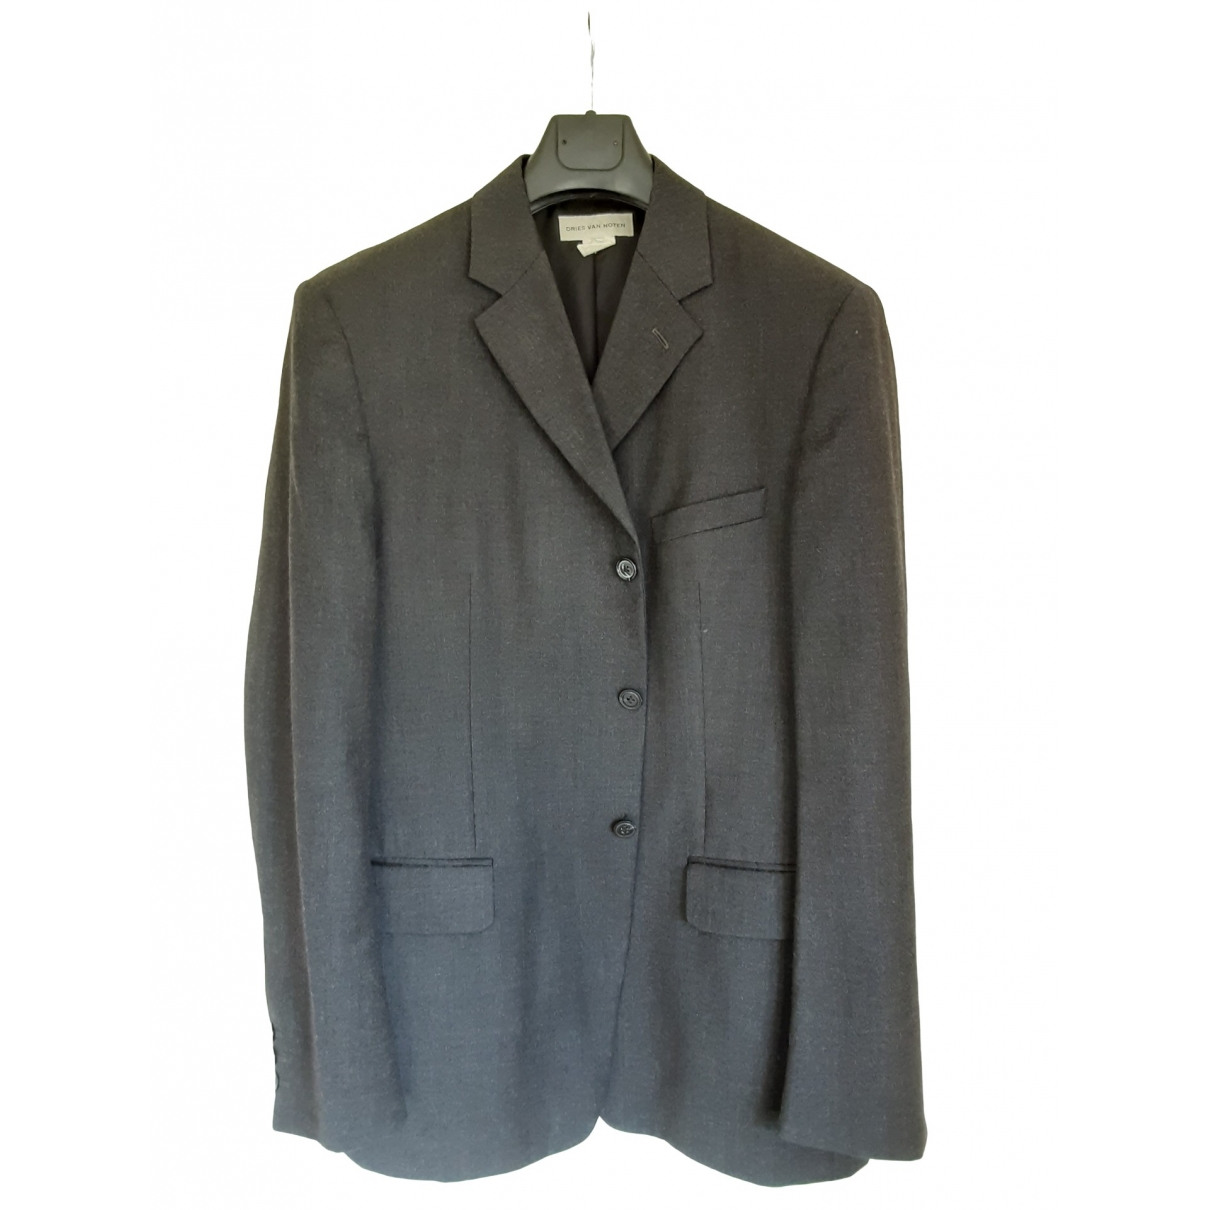 Dries Van Noten \N Anthracite Wool jacket  for Men 54 IT